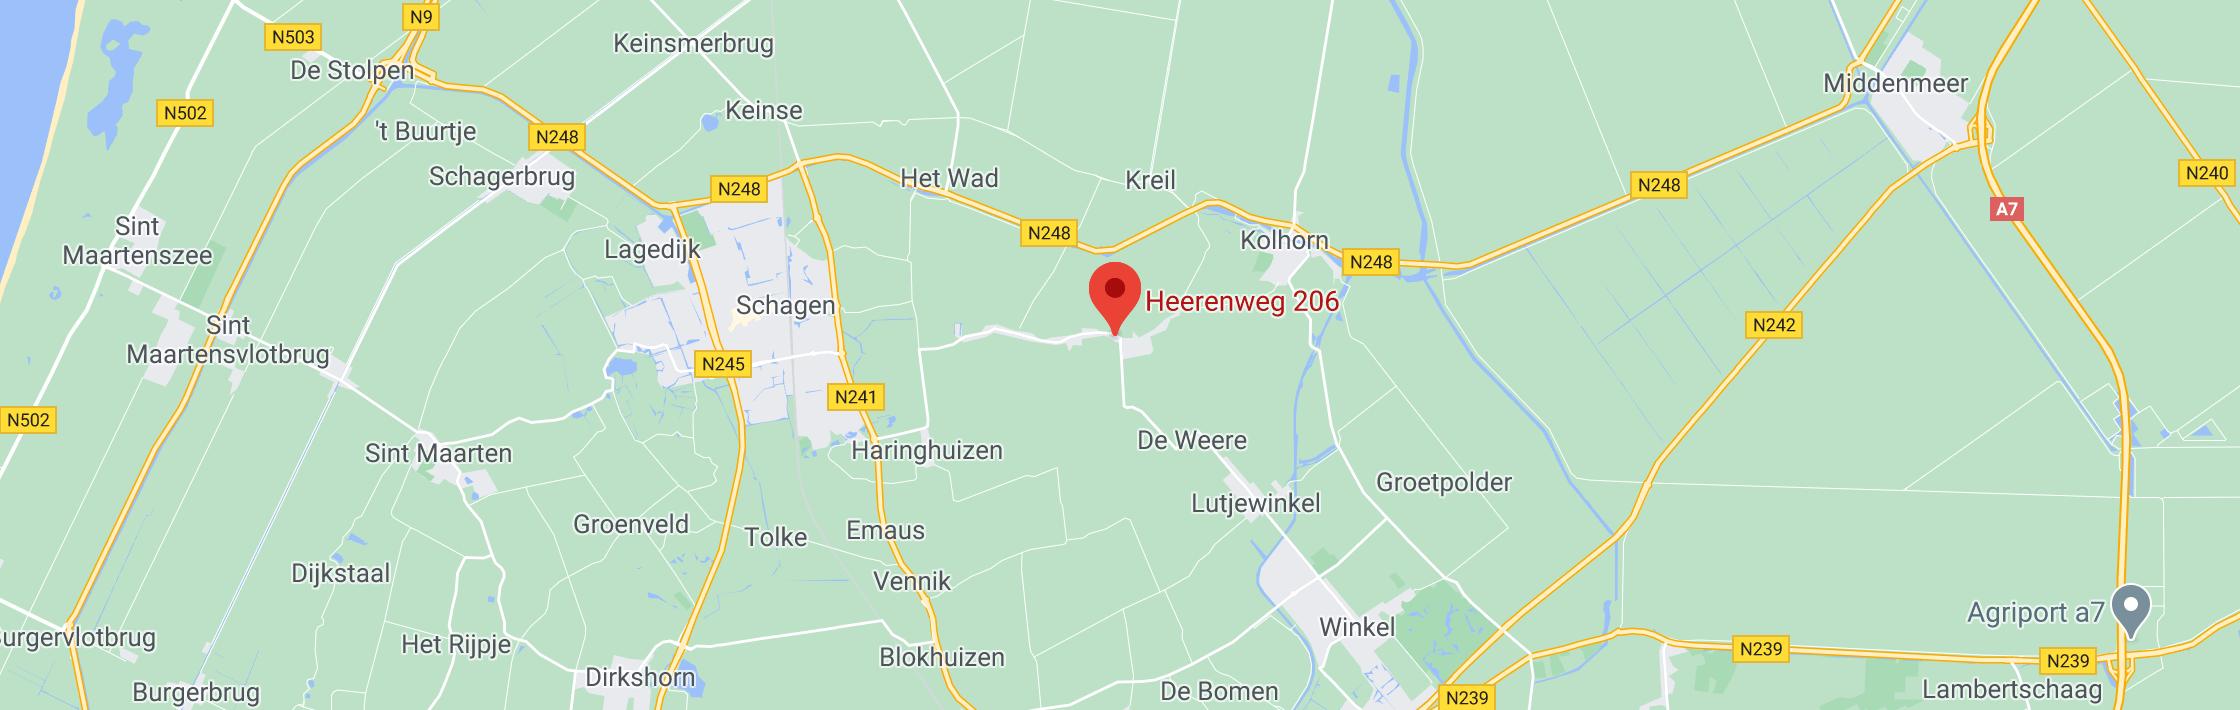 Lokatie-Google-Maps